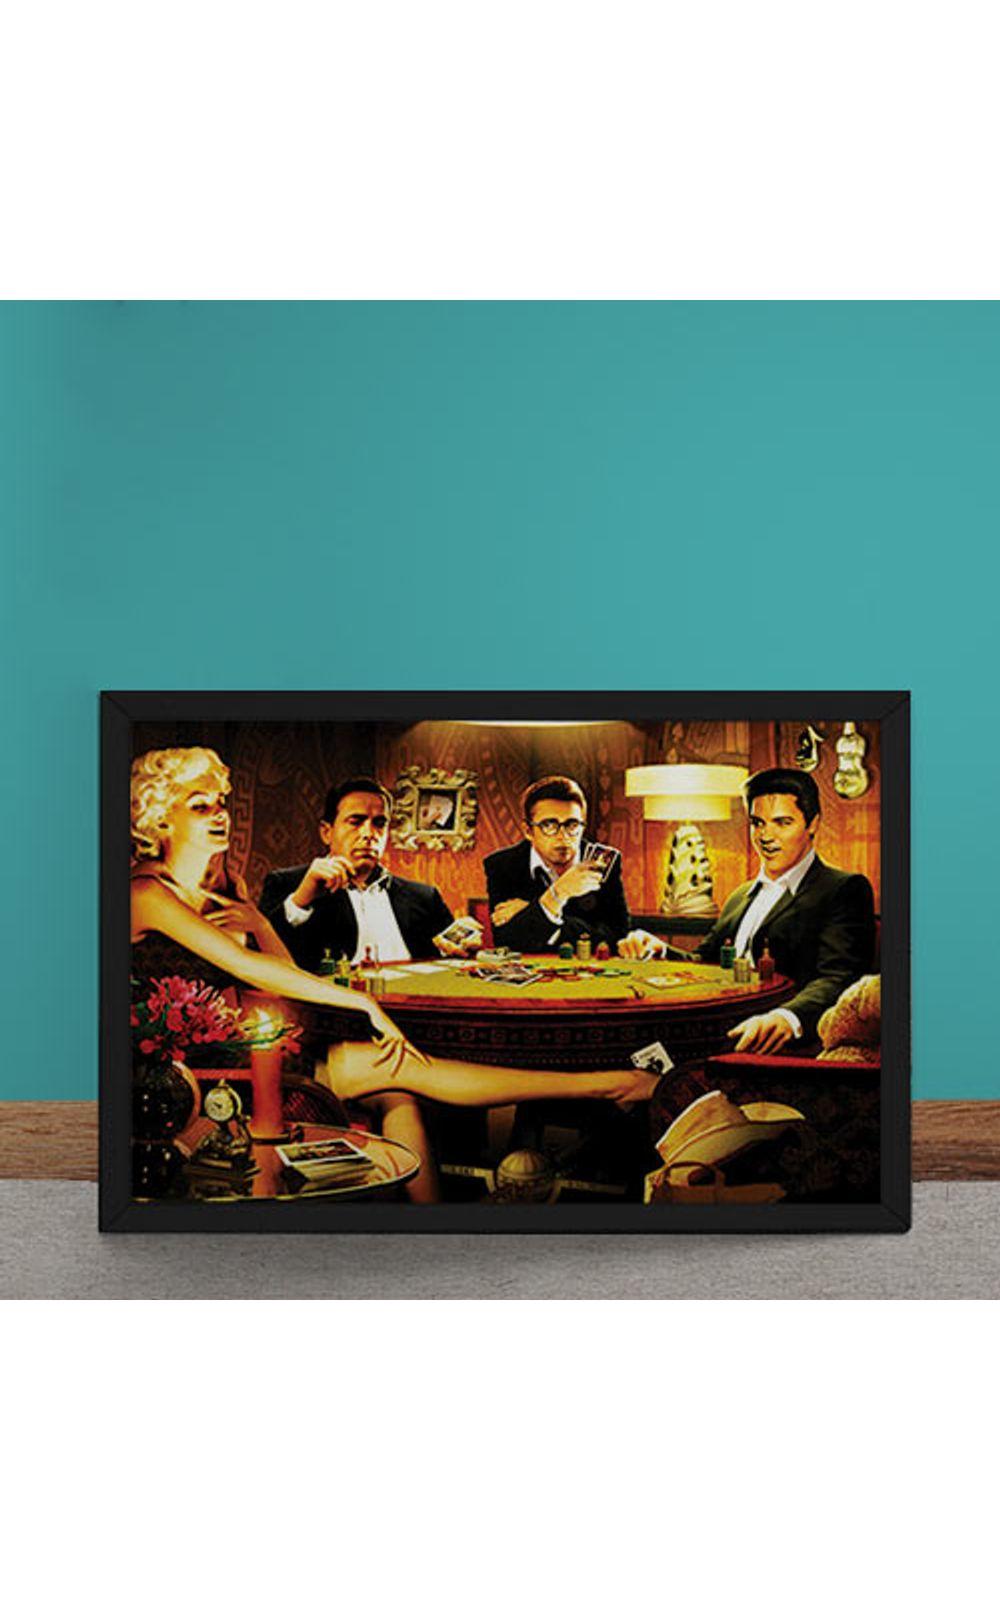 Foto 1 - Quadro Decorativo Baralho Marilyn Monroes Elvis Presley James Dean Humphrey Bogart